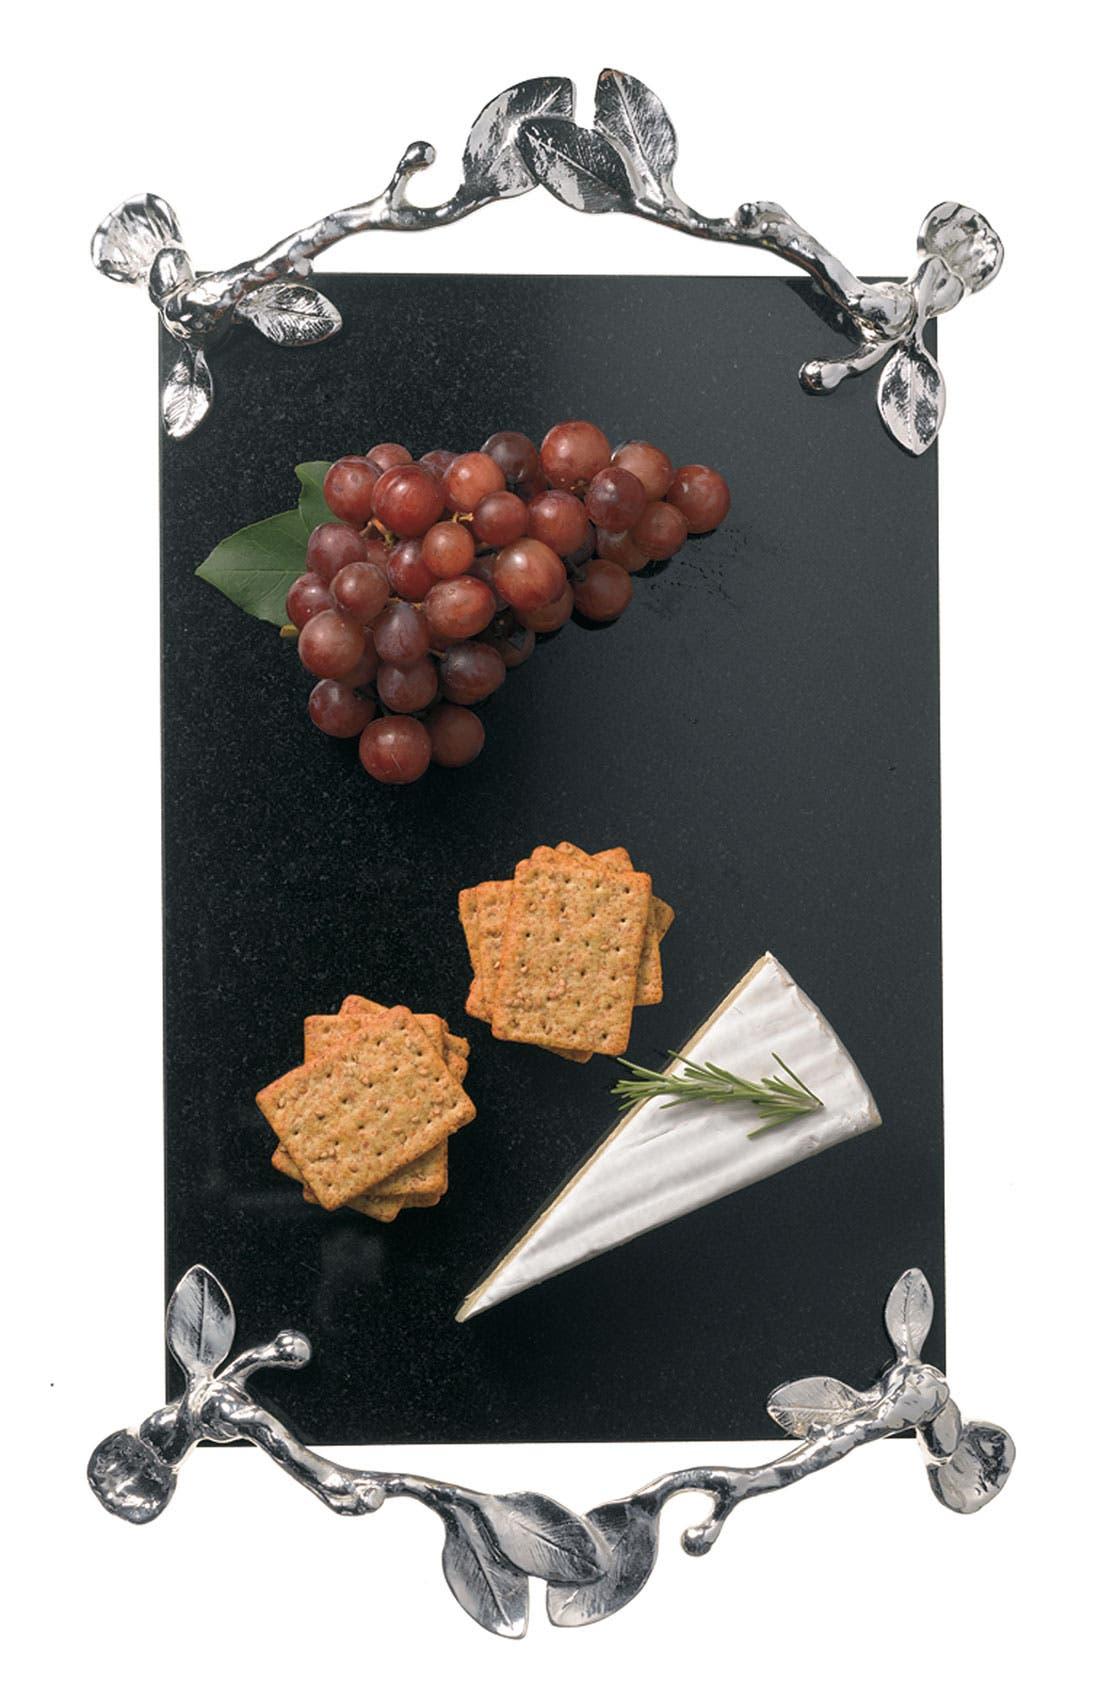 Alternate Image 3  - Michael Aram 'Sleepy Hollow' Granite Cheese Board